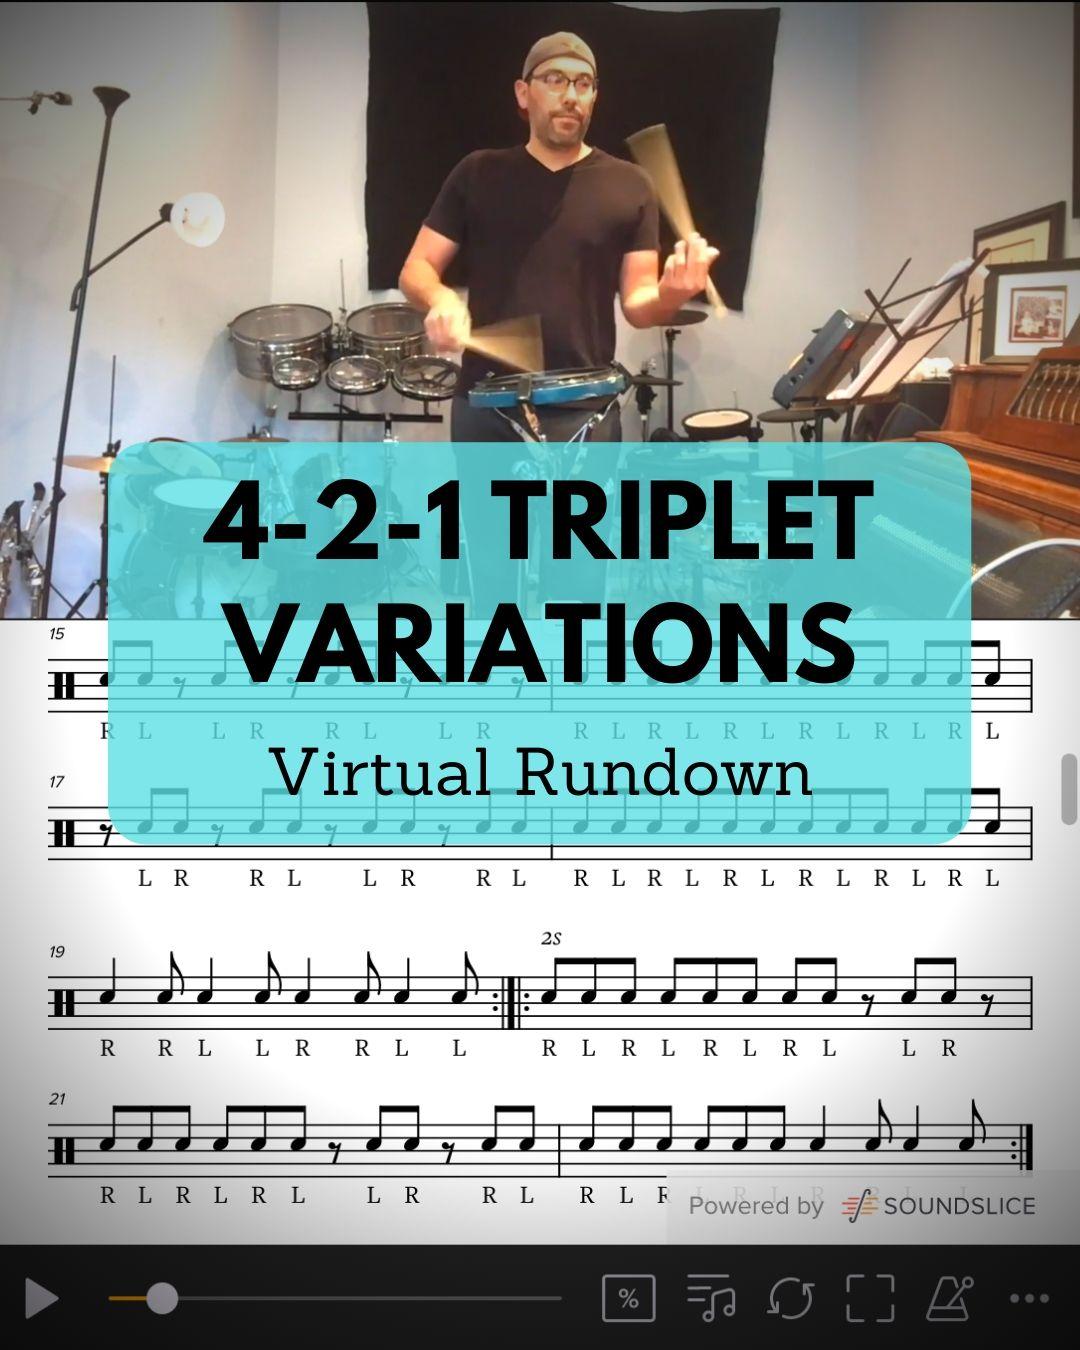 4-2-1 Triplet Variations